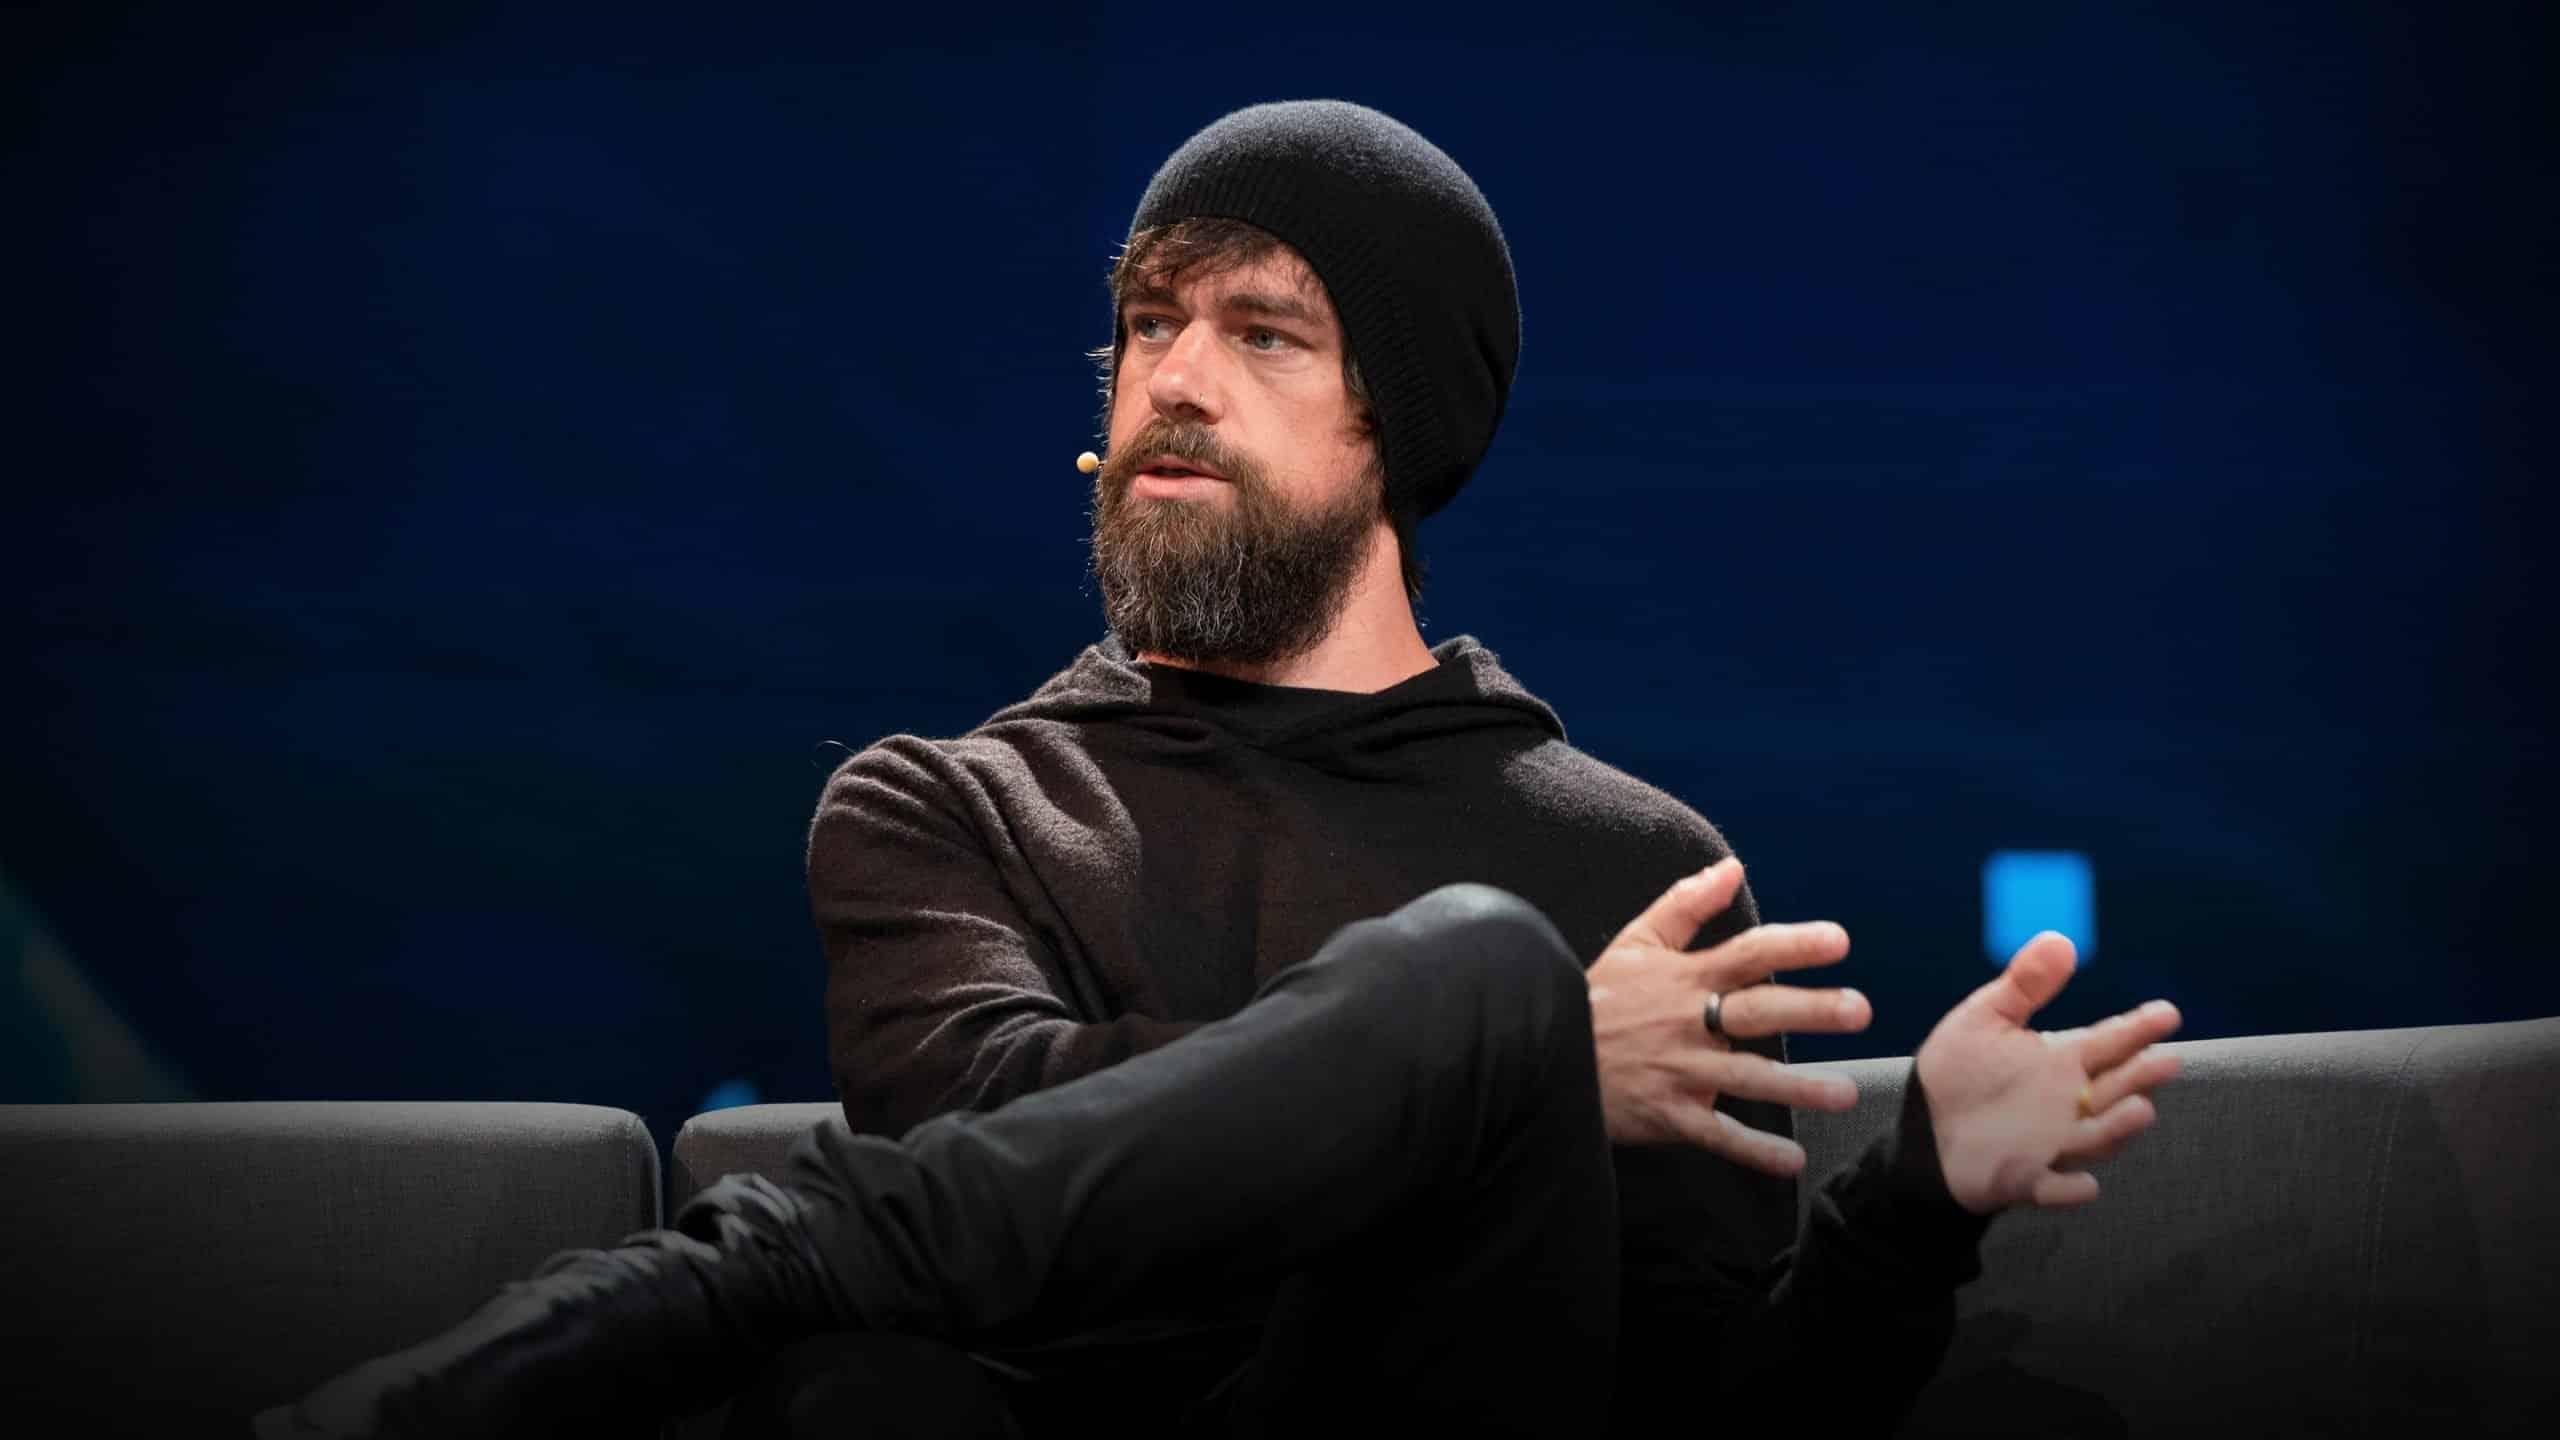 jack-dorsey-twitter-bitcoin-criptomoedas-futuro-economia